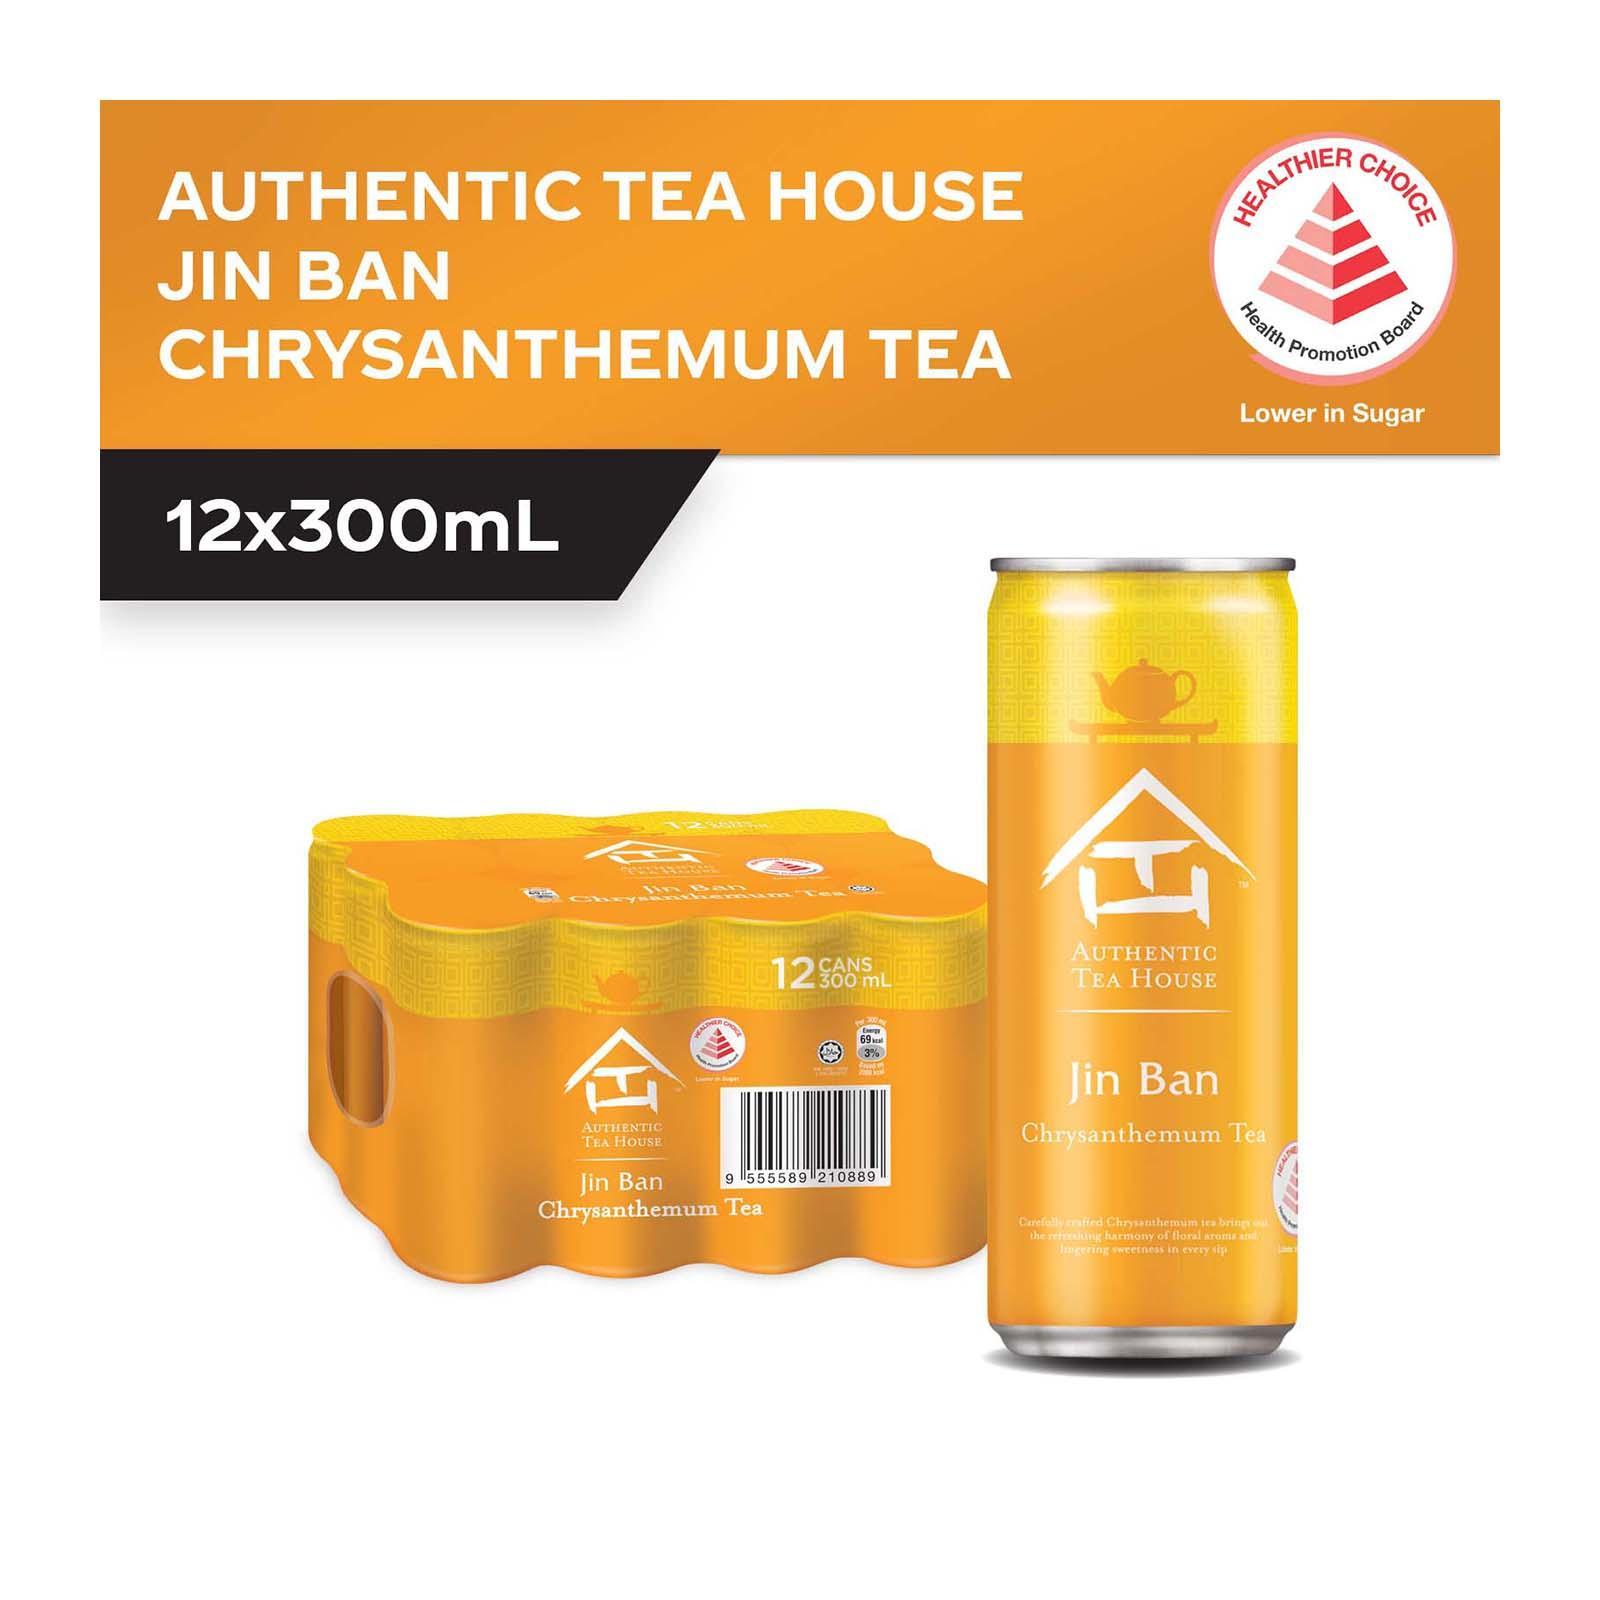 Authentic Tea House Jin Ban Chrysanthemum Tea (12 x 300ml) - Case